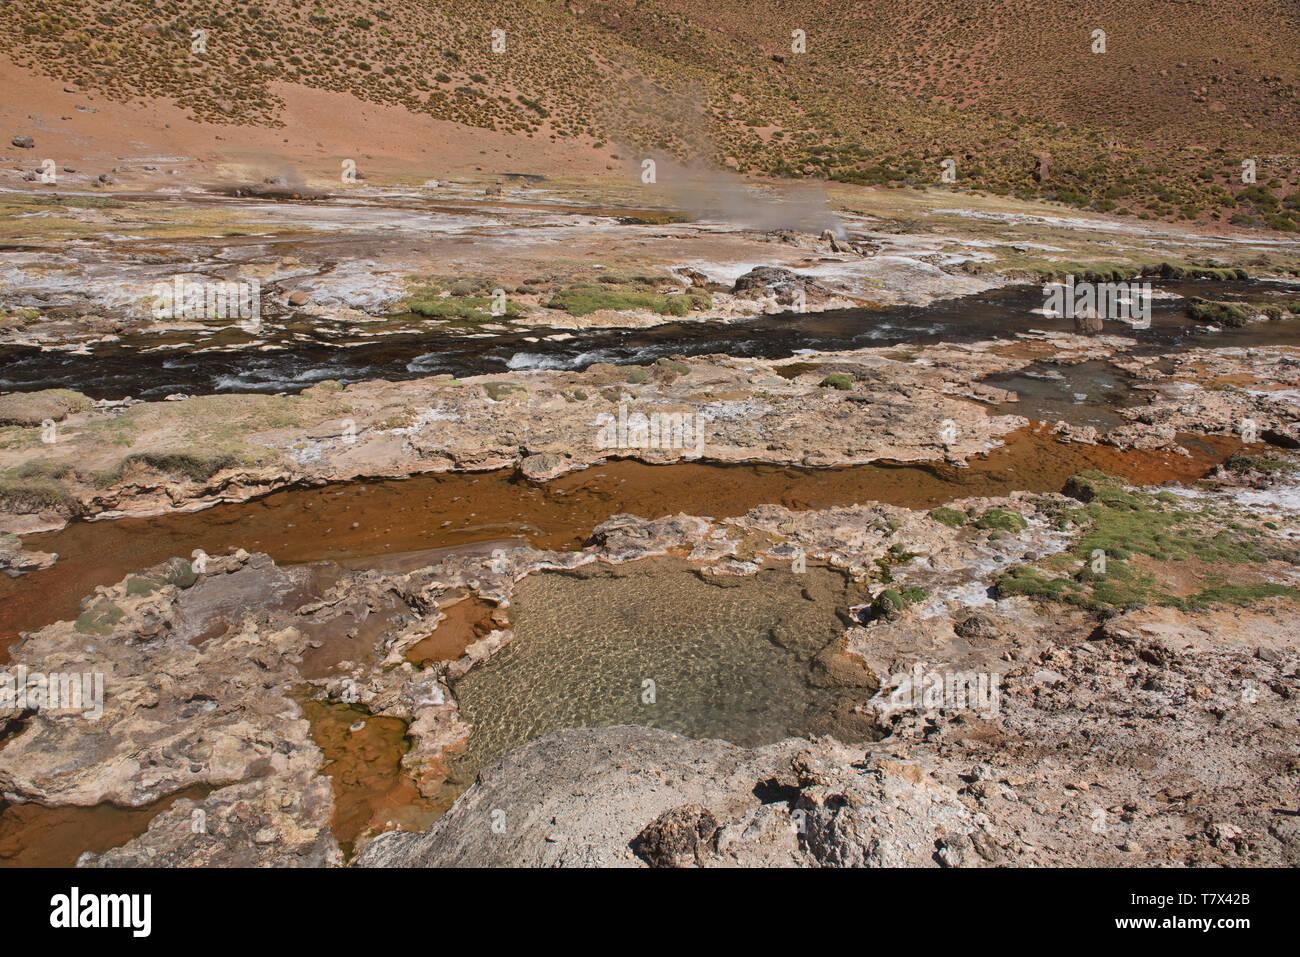 The thermal boiling Rio Blanco river near El Tatio Geyser, San Pedro de Atacama, Chile Stock Photo